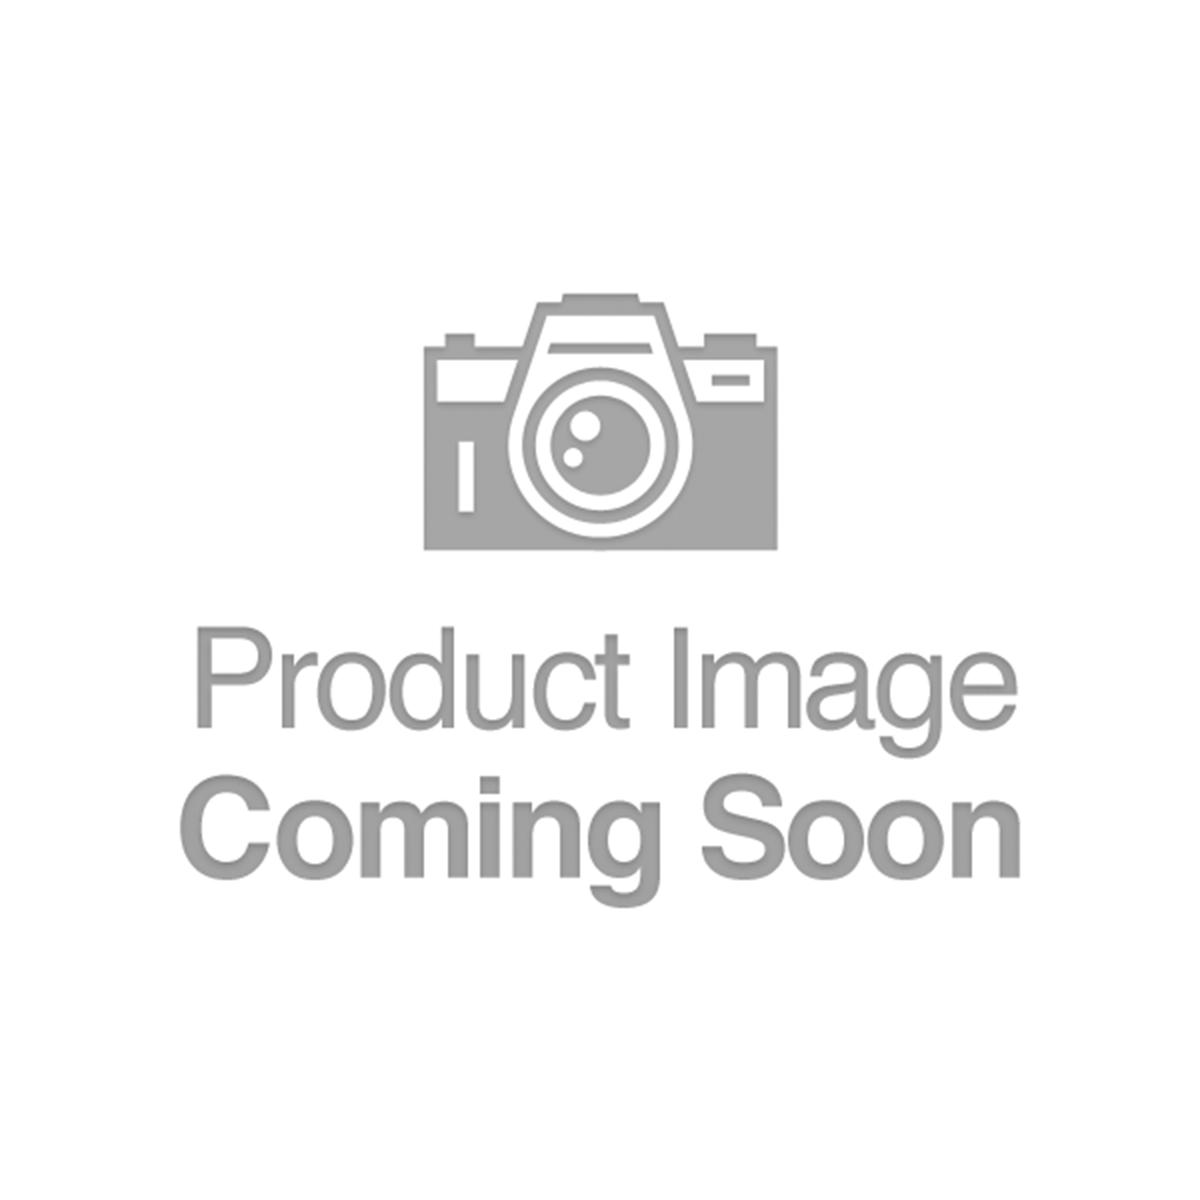 1875 3CN Three Cent Nickel PCGS PR65 (CAC)